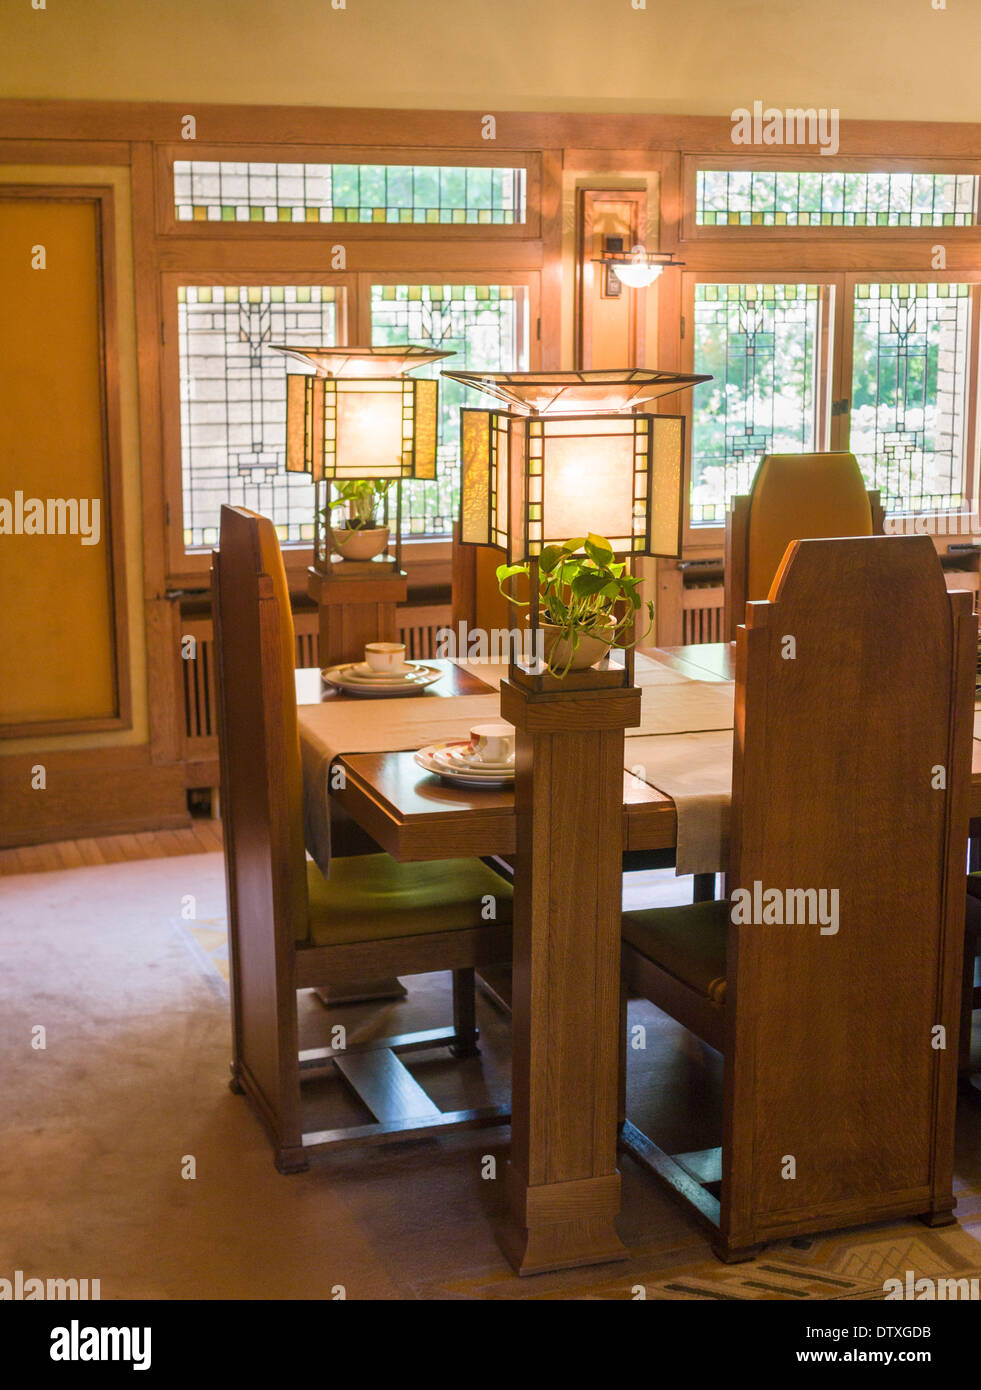 Frank lloyd wright chair stockfotos frank lloyd wright for Fenster lampen